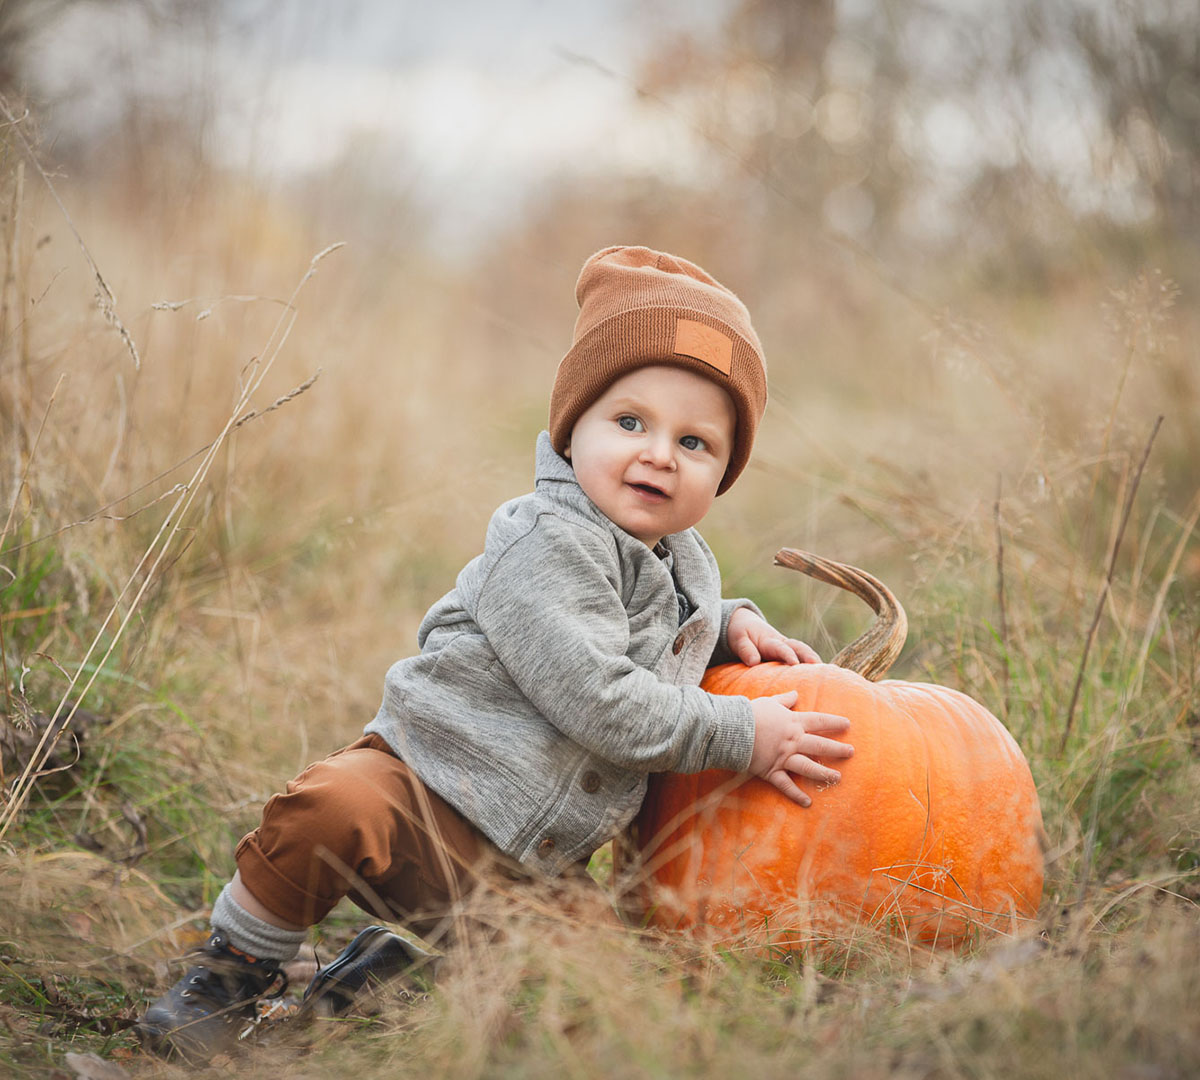 Barn- & Familjefotografering